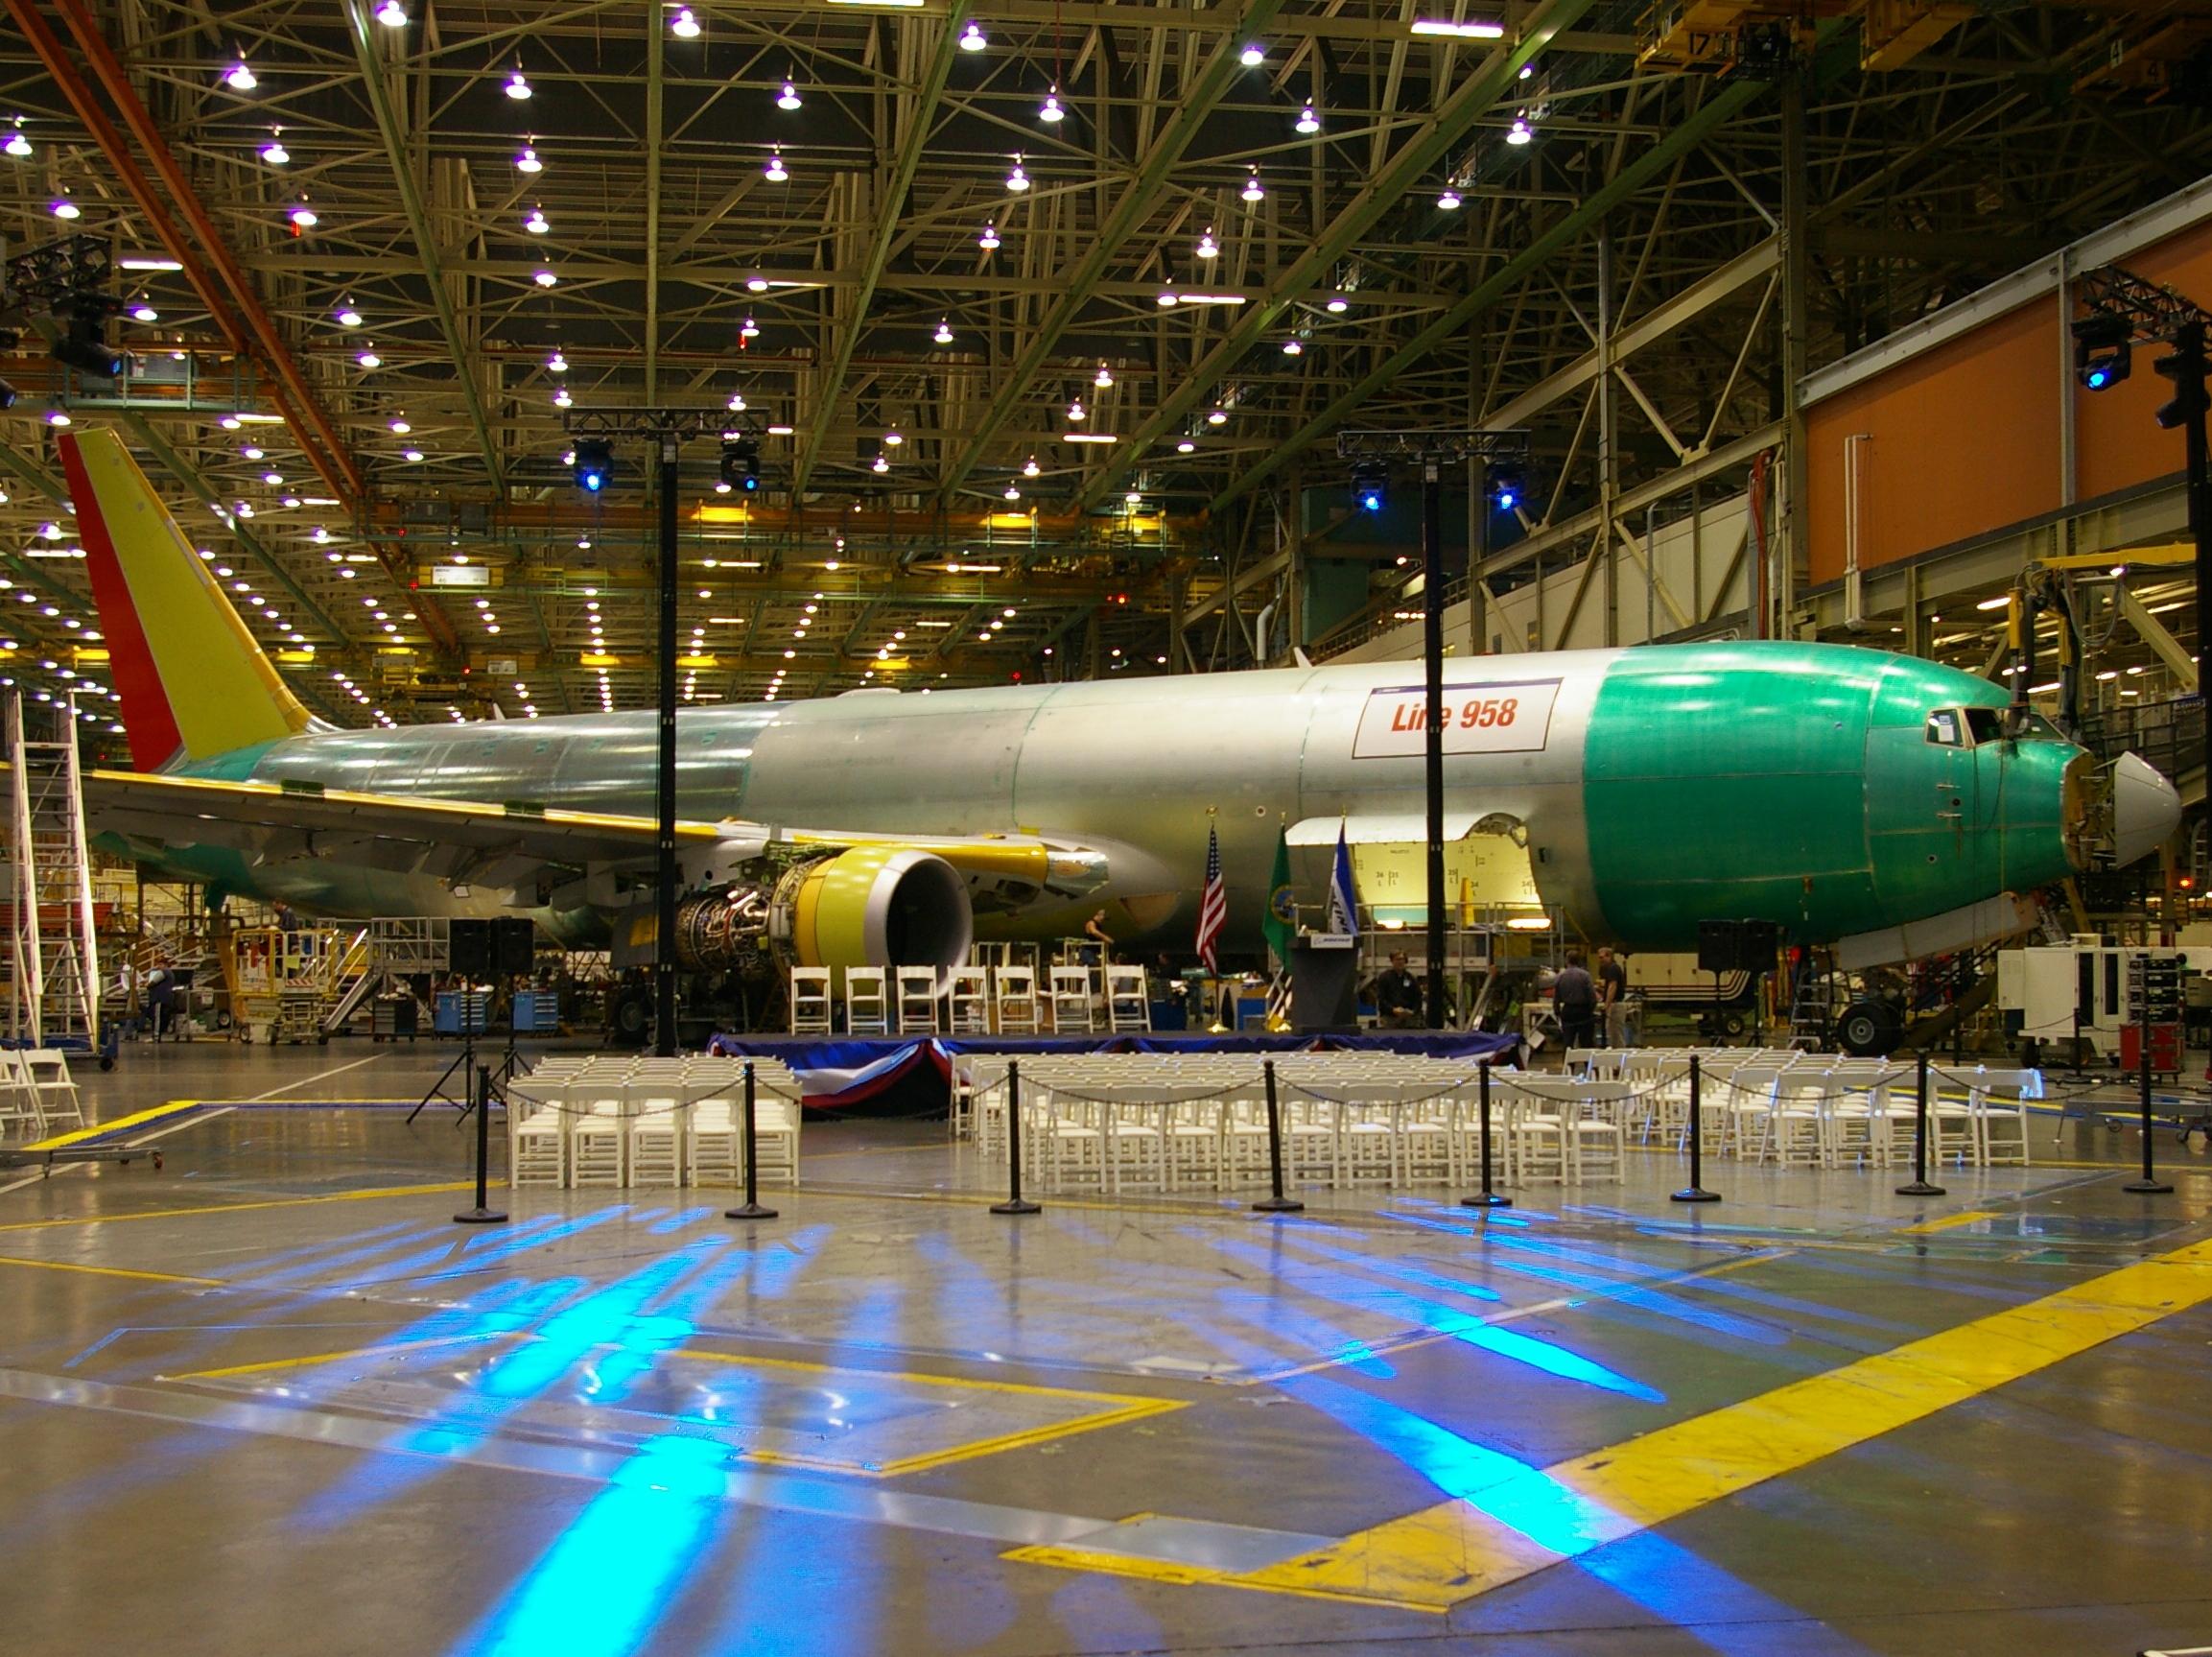 Boeing_767_Everett,_Washington_production_line.jpg